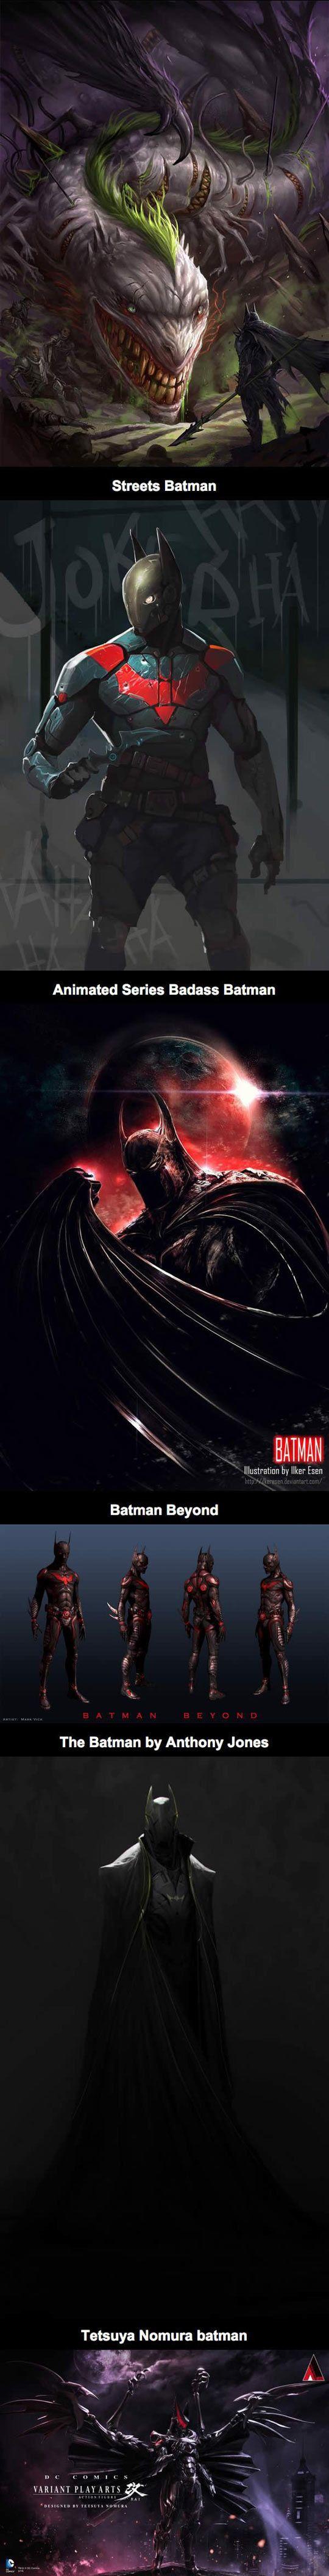 Alternate Batman series #1